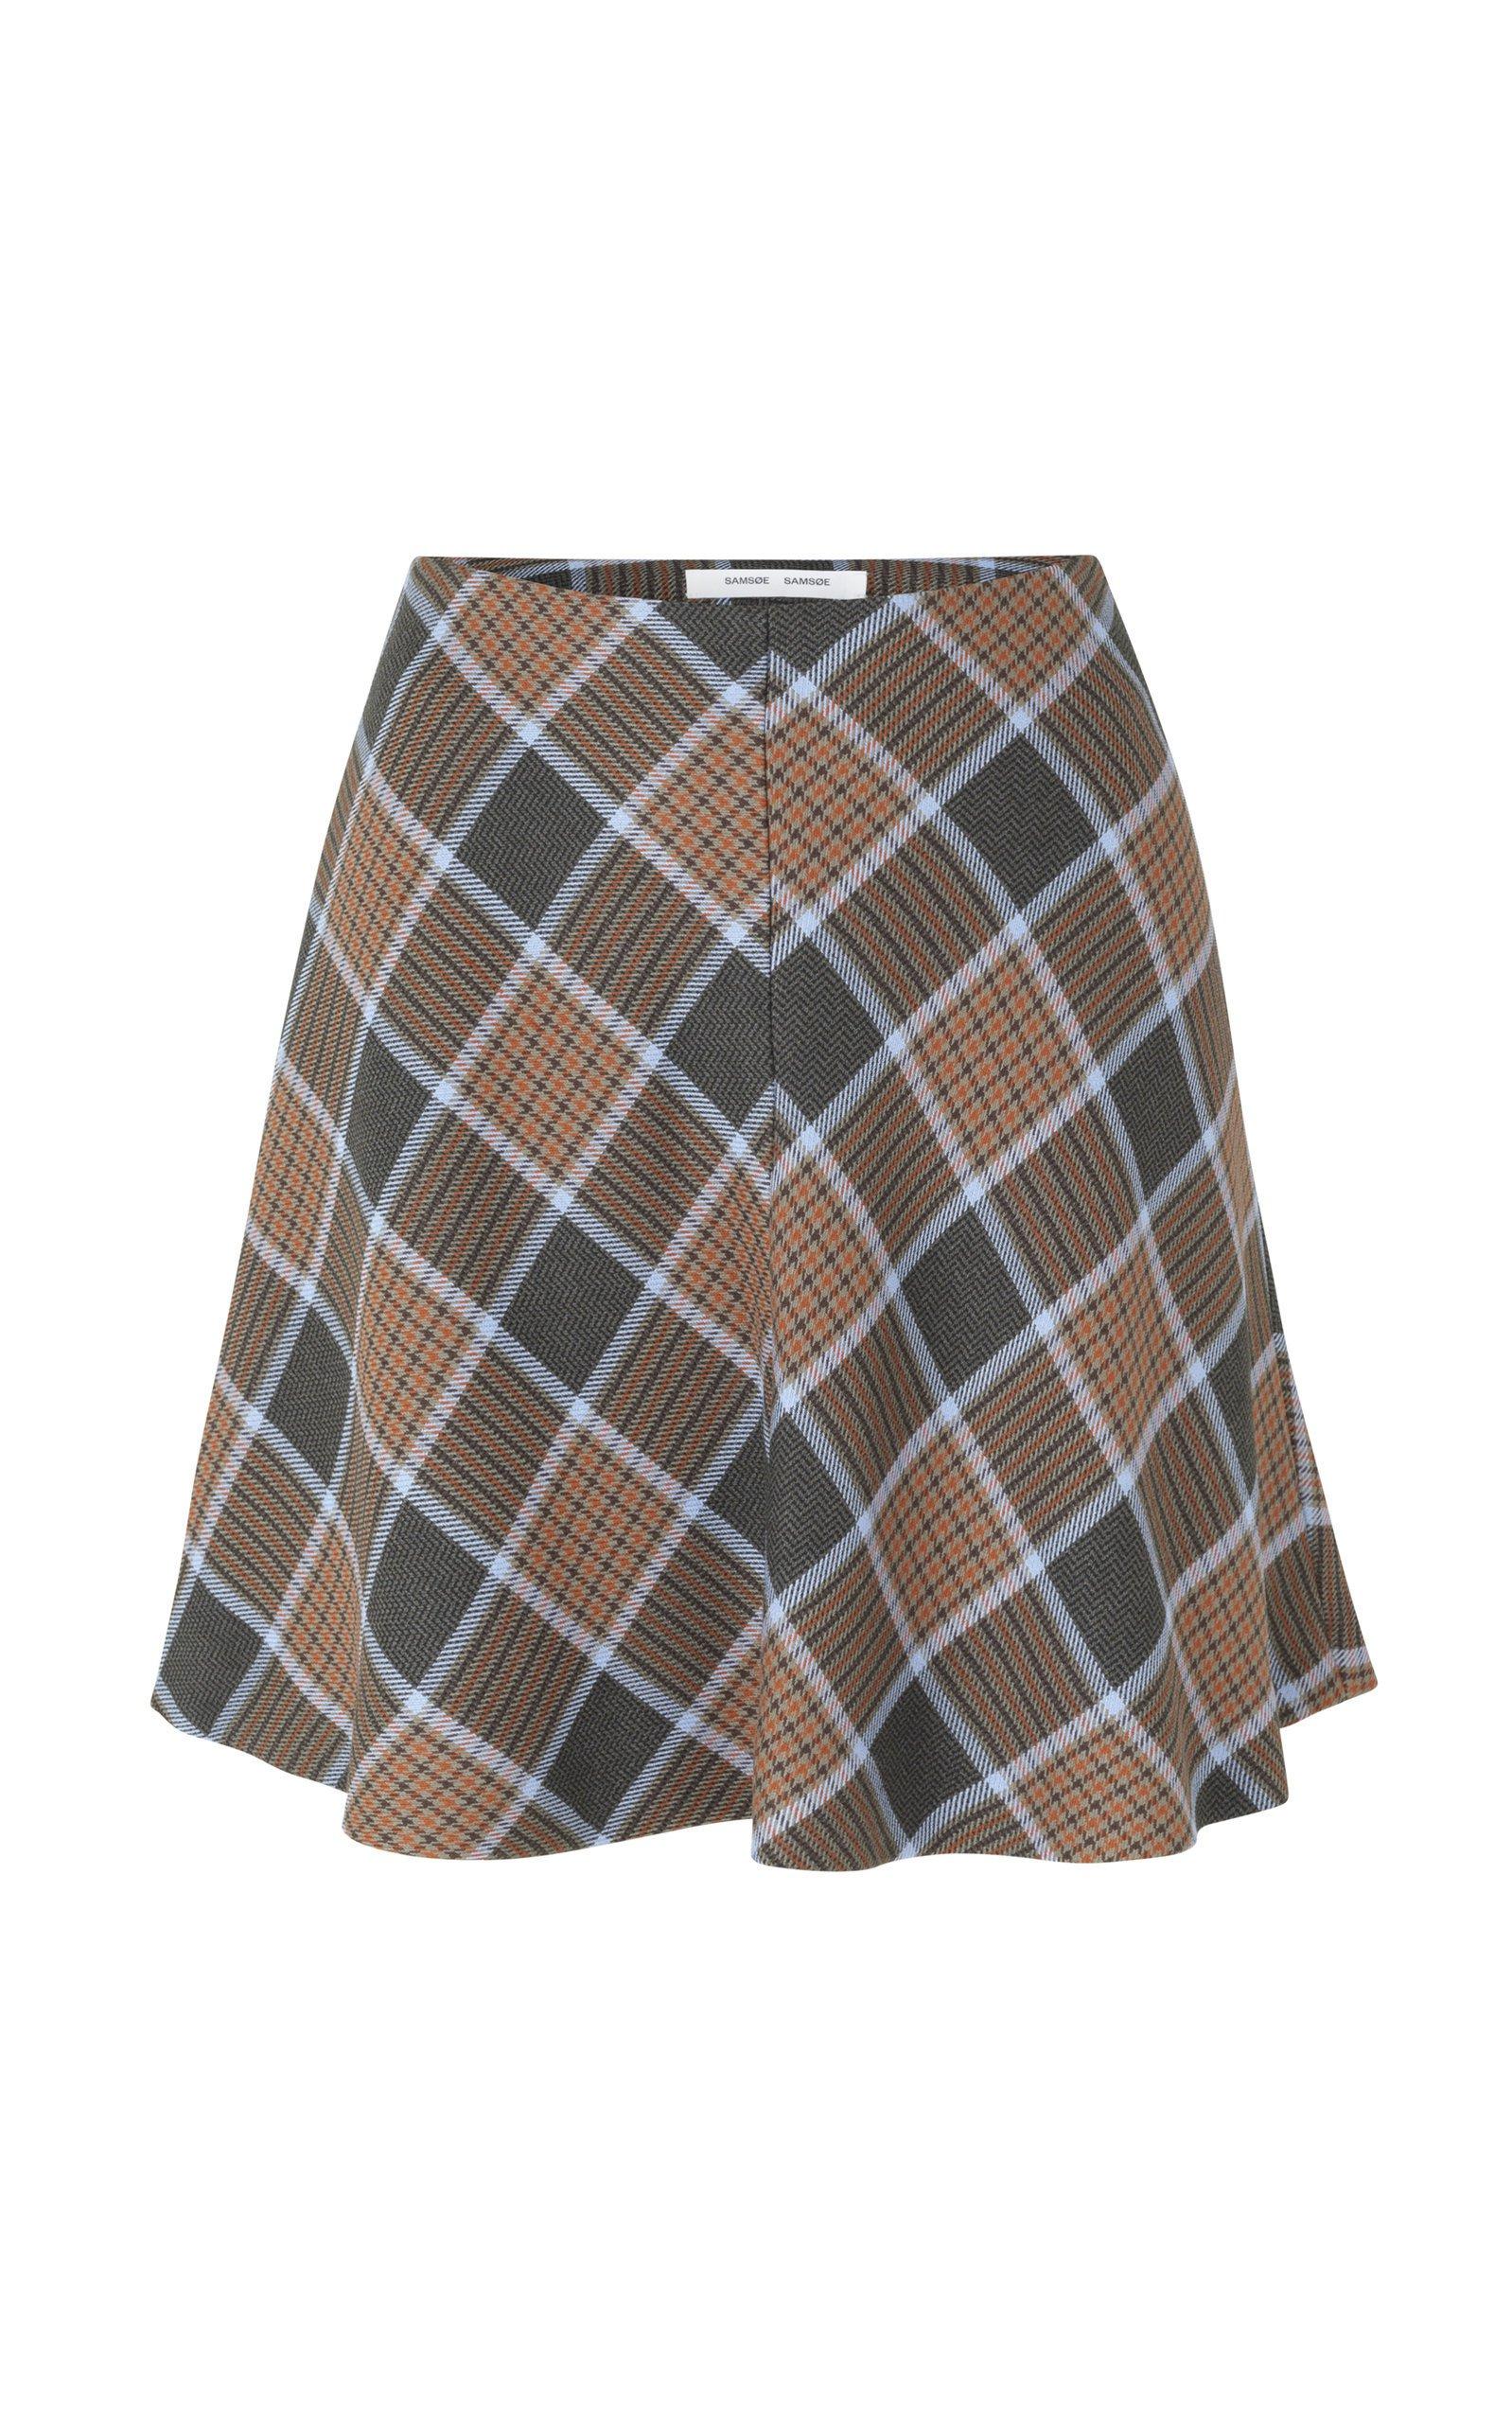 Samsøe Samsøe Kora Plaid Skirt Size: S